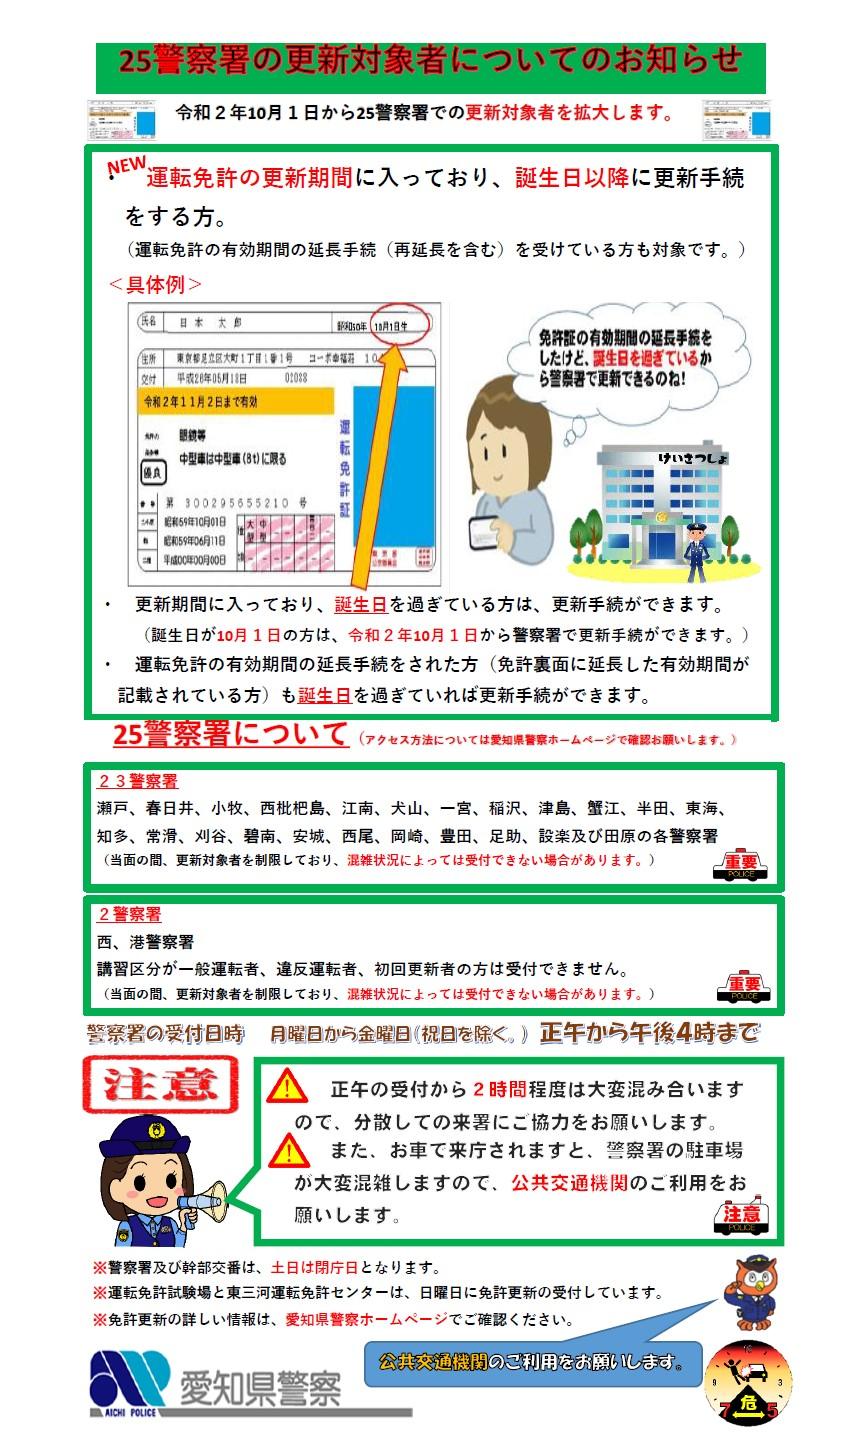 警察 署 更新 津島 免許 津島警察署での免許更新|運転免許証の更新手続